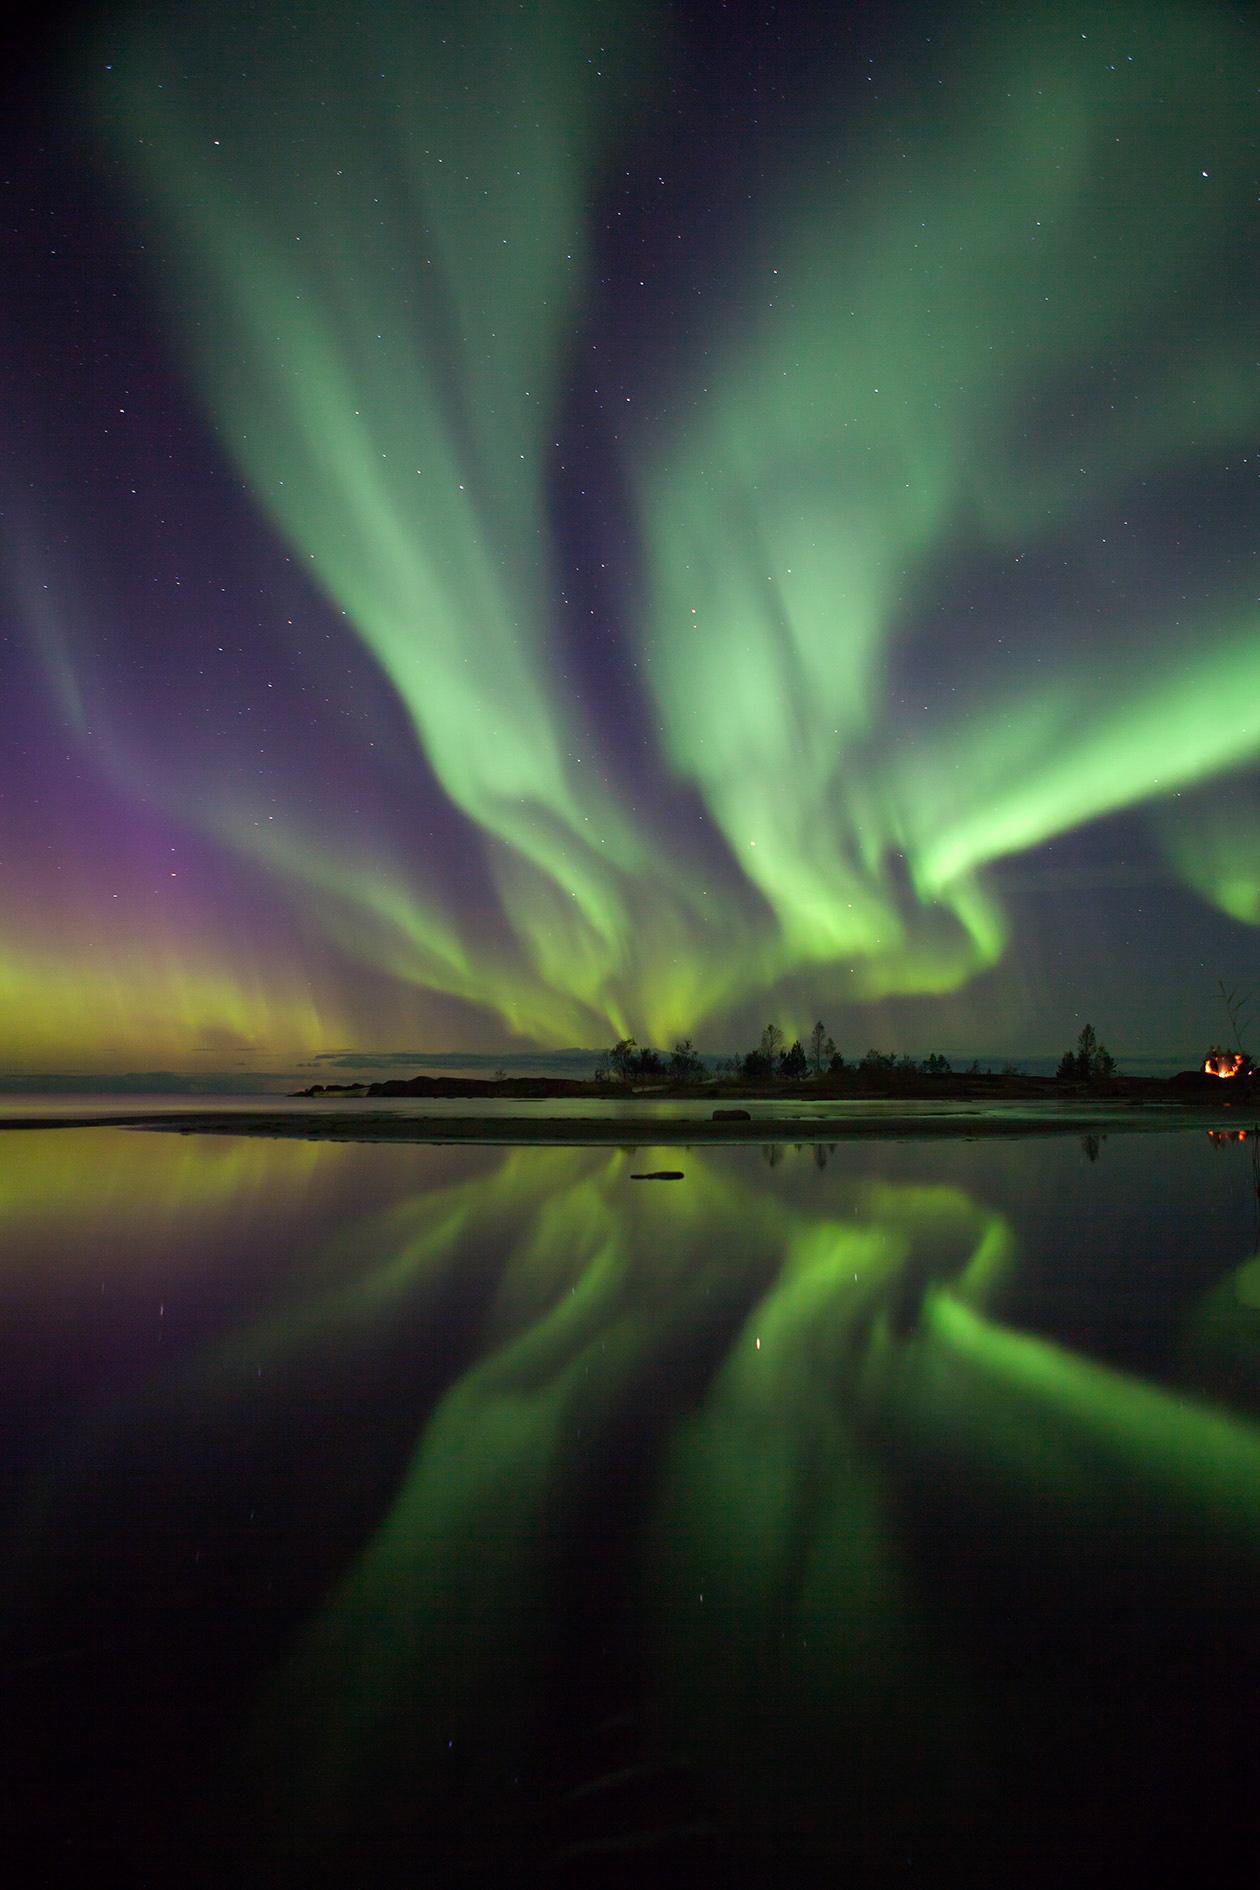 The Aurora Borealis (Northern Lights) in Jakobstad, Finland